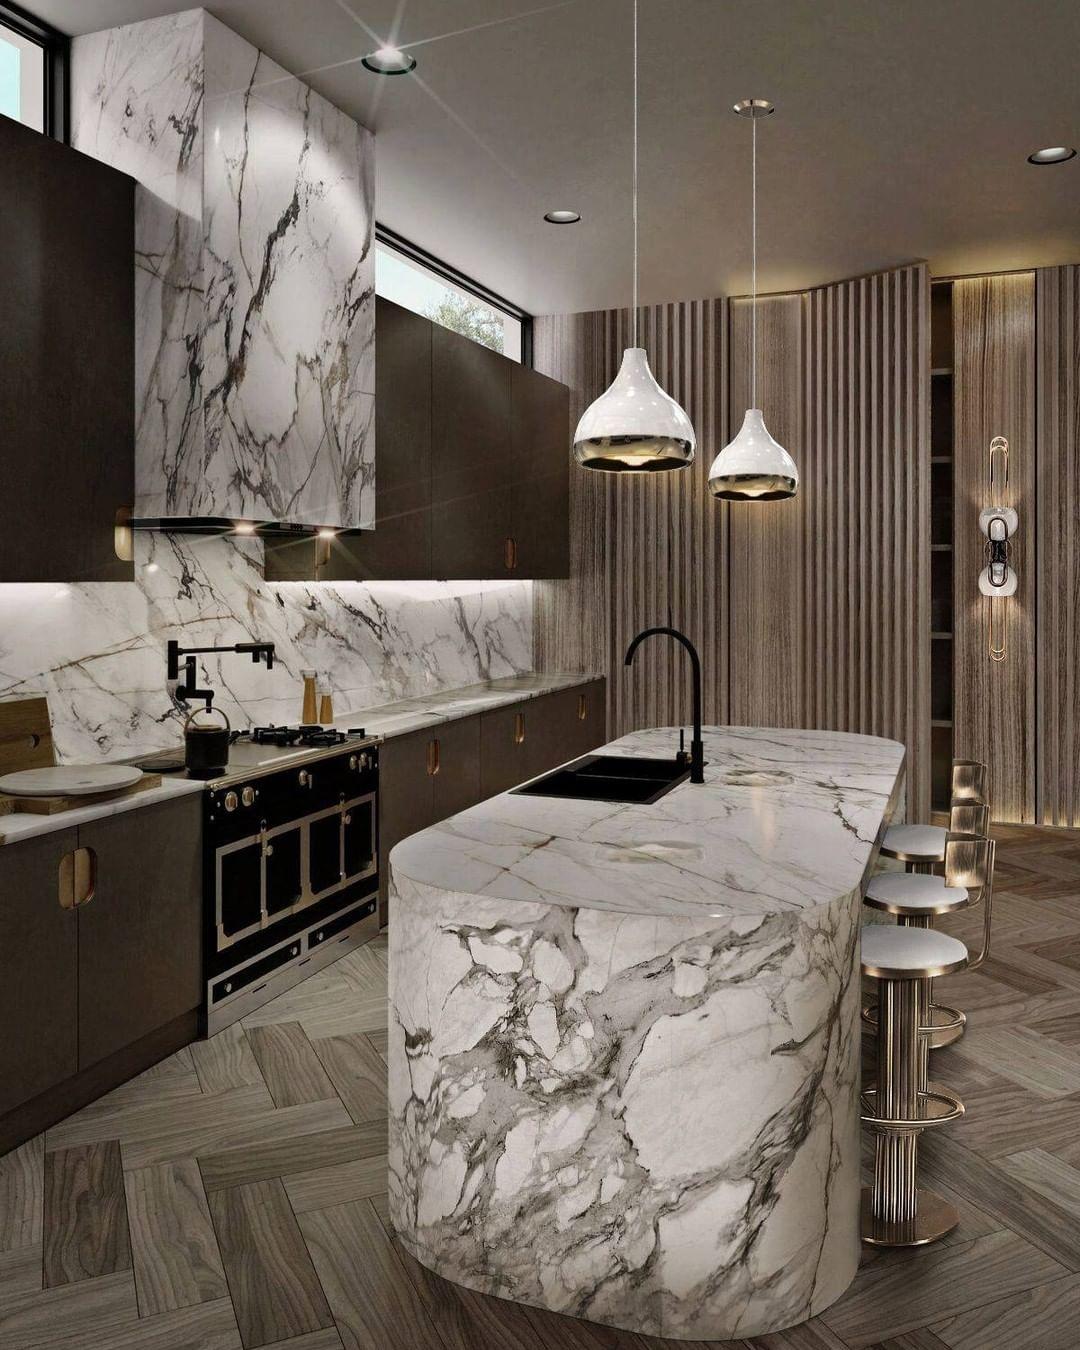 kitchen decor ideas Modern Kitchen Decor Ideas For 2021 modern kitchen decor ideas for 2021 3